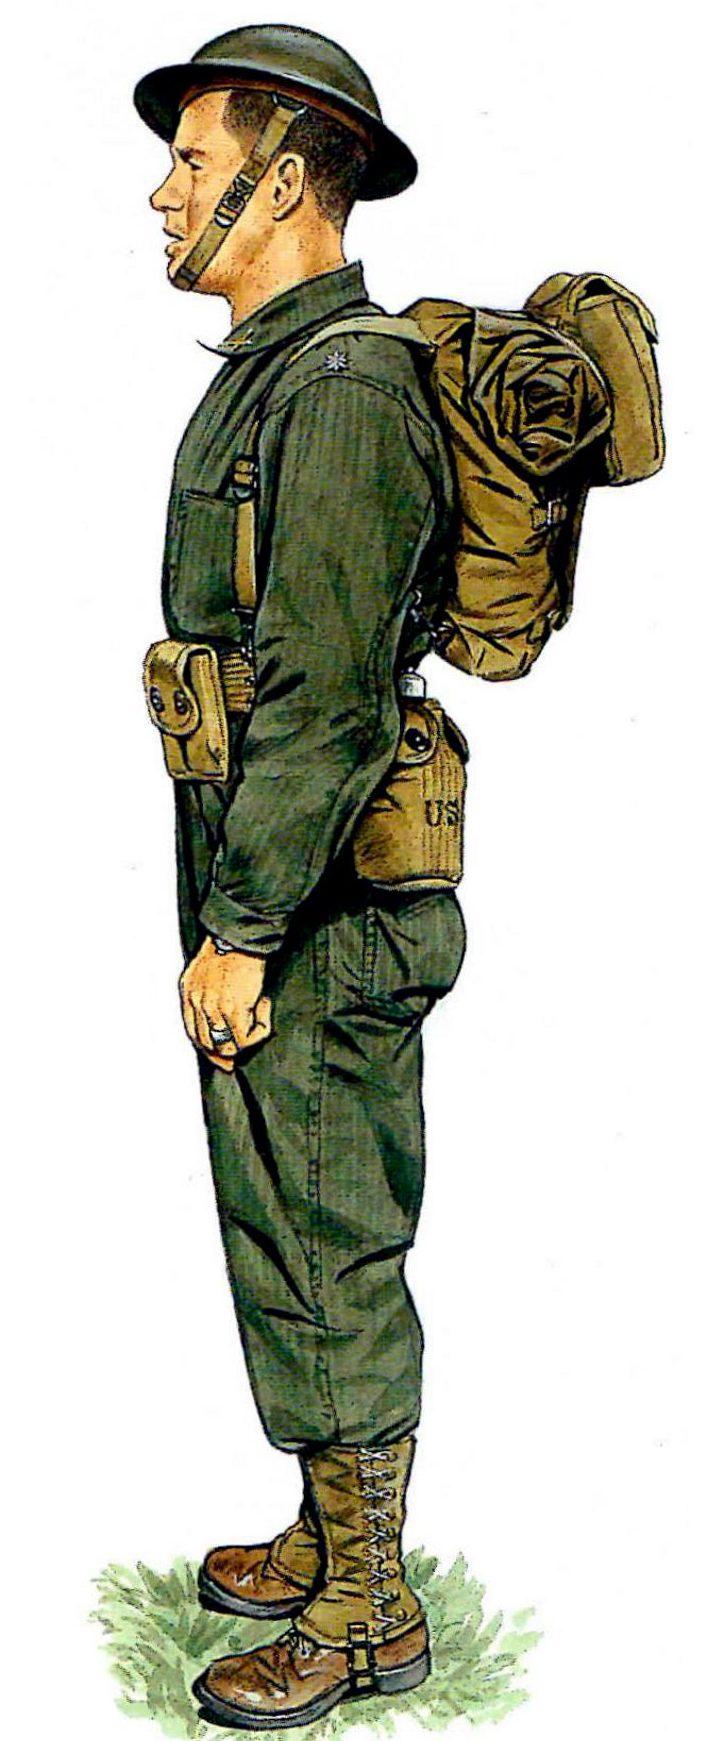 Volstad Ronald. Подполковник Willian Darby.